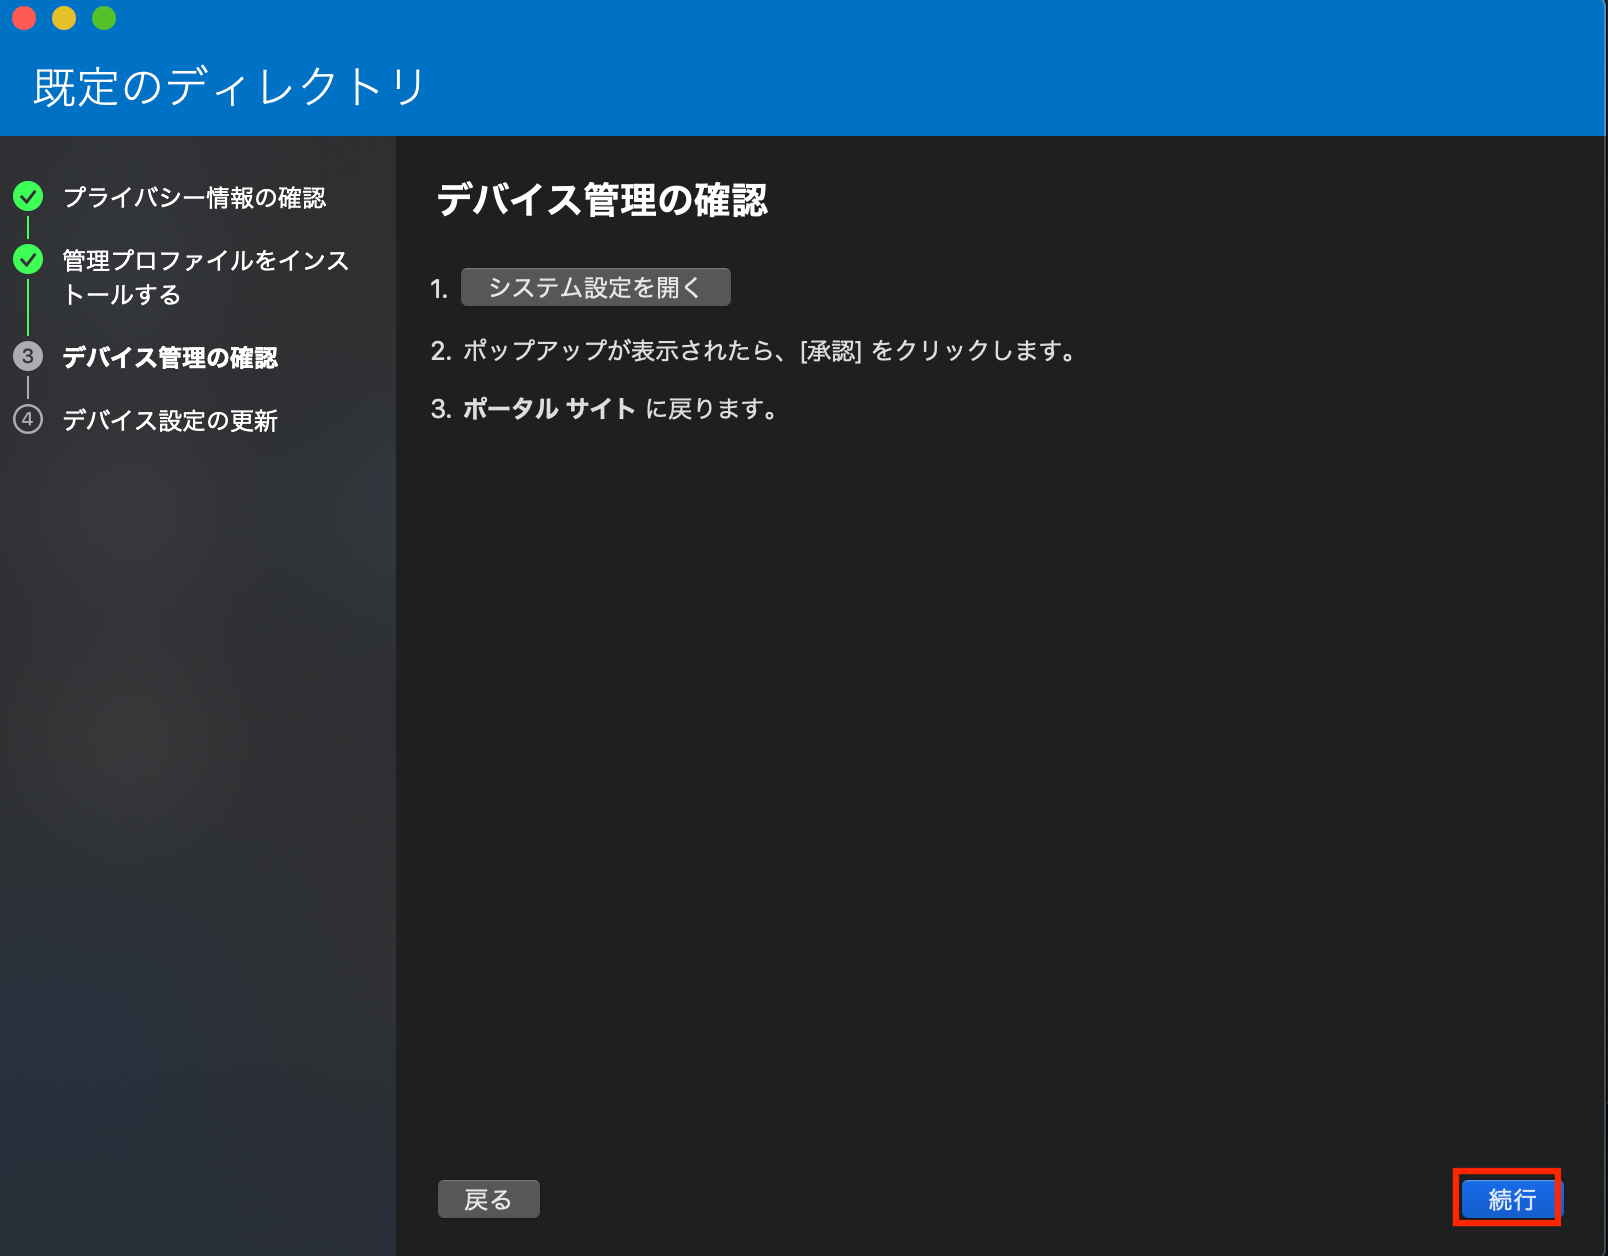 portal_site_10.png